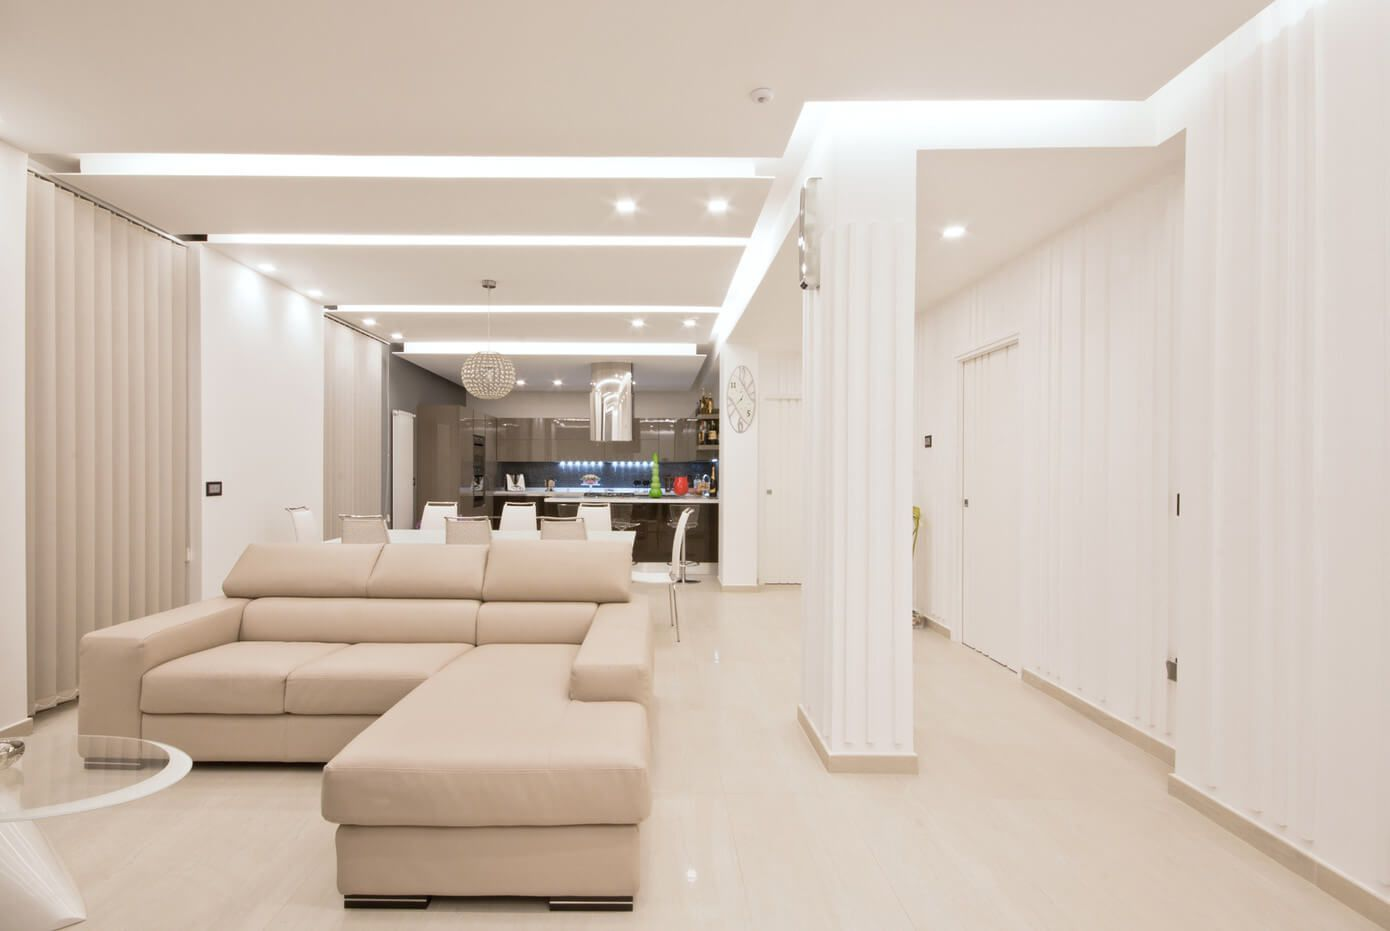 Interior-I--by-b2c-architects-11